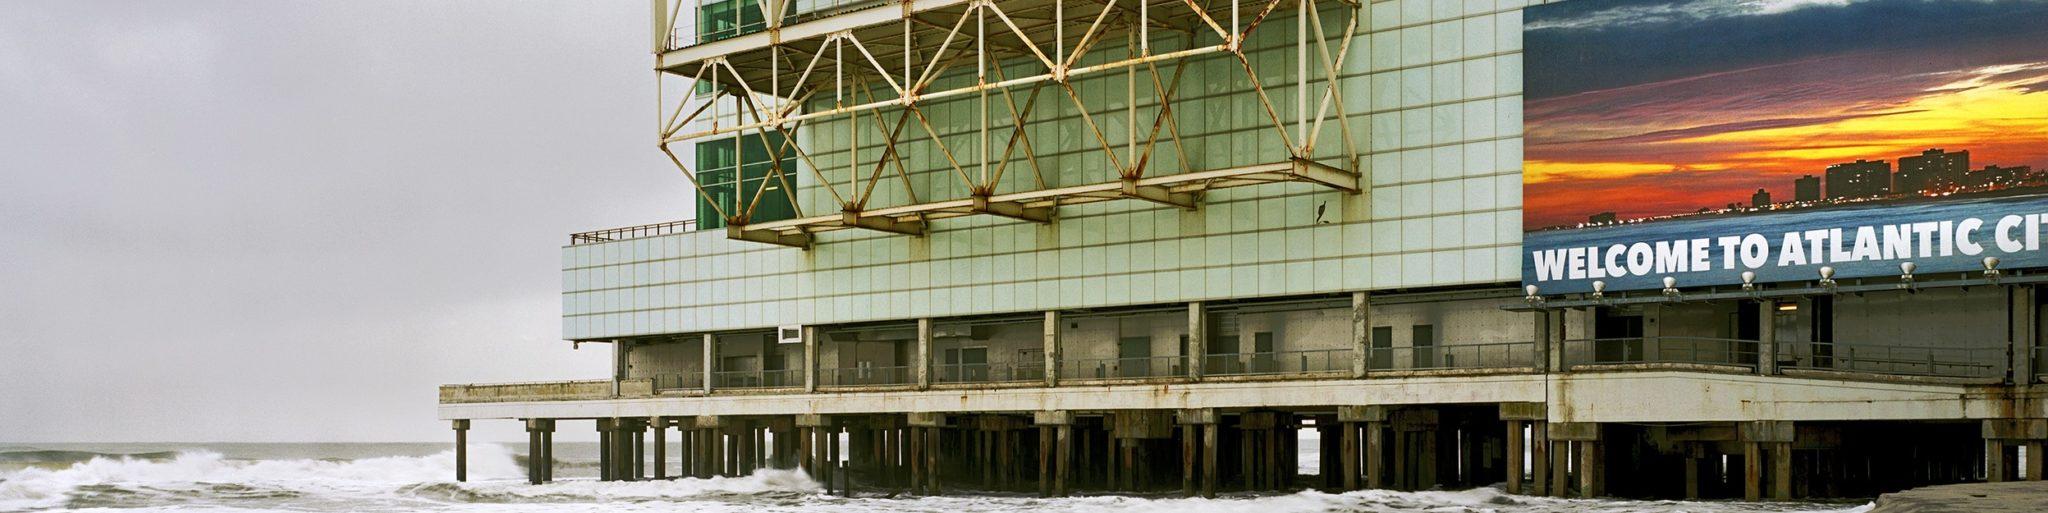 Atlantic City, Forlorn